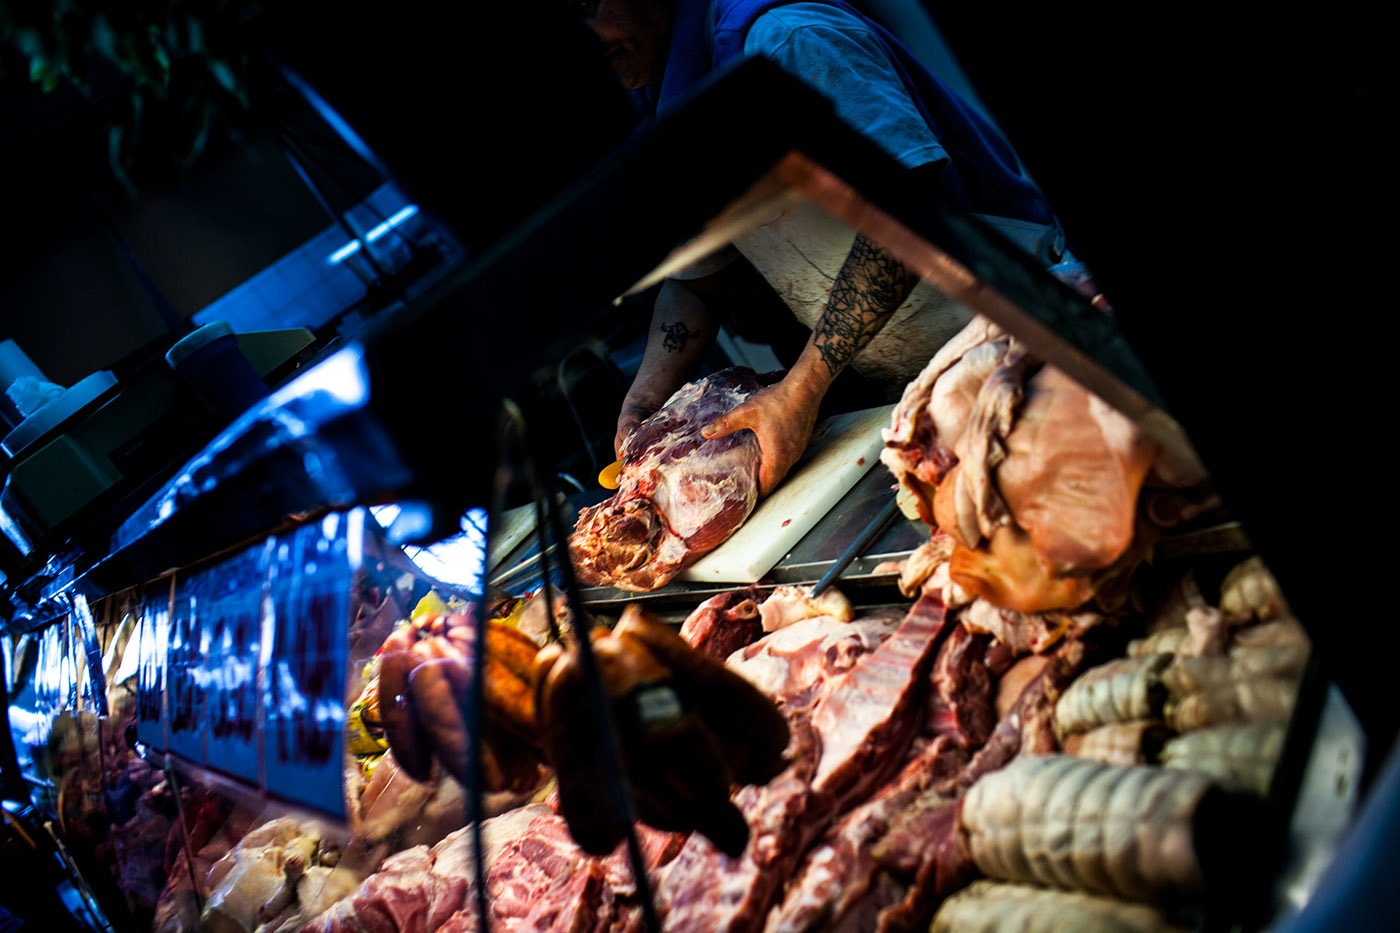 Meat market in Santiago, Chile